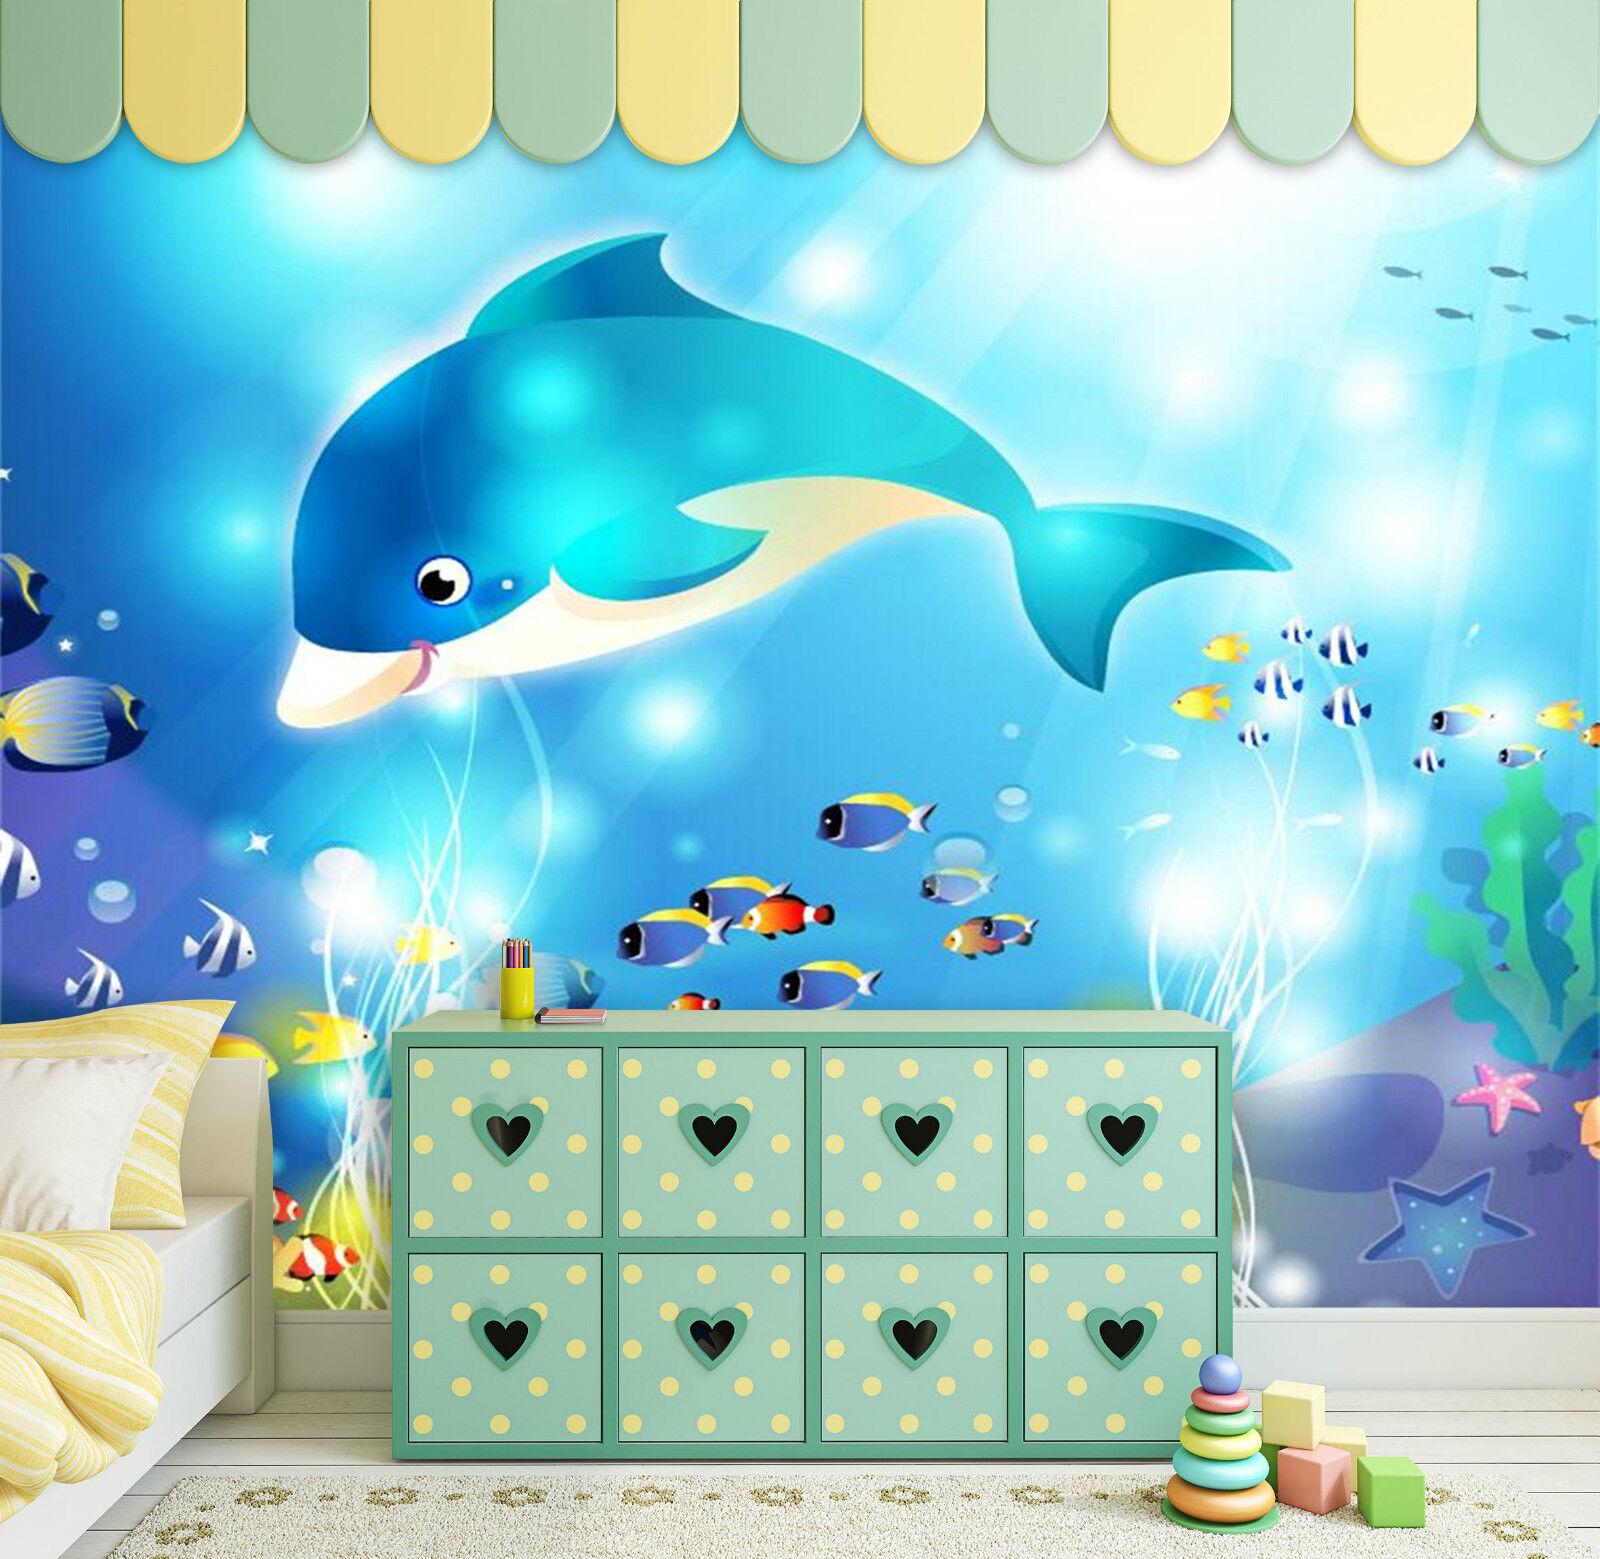 3D Blauwal 072 Fototapeten Wandbild Fototapete Bild Tapete Familie Kinder